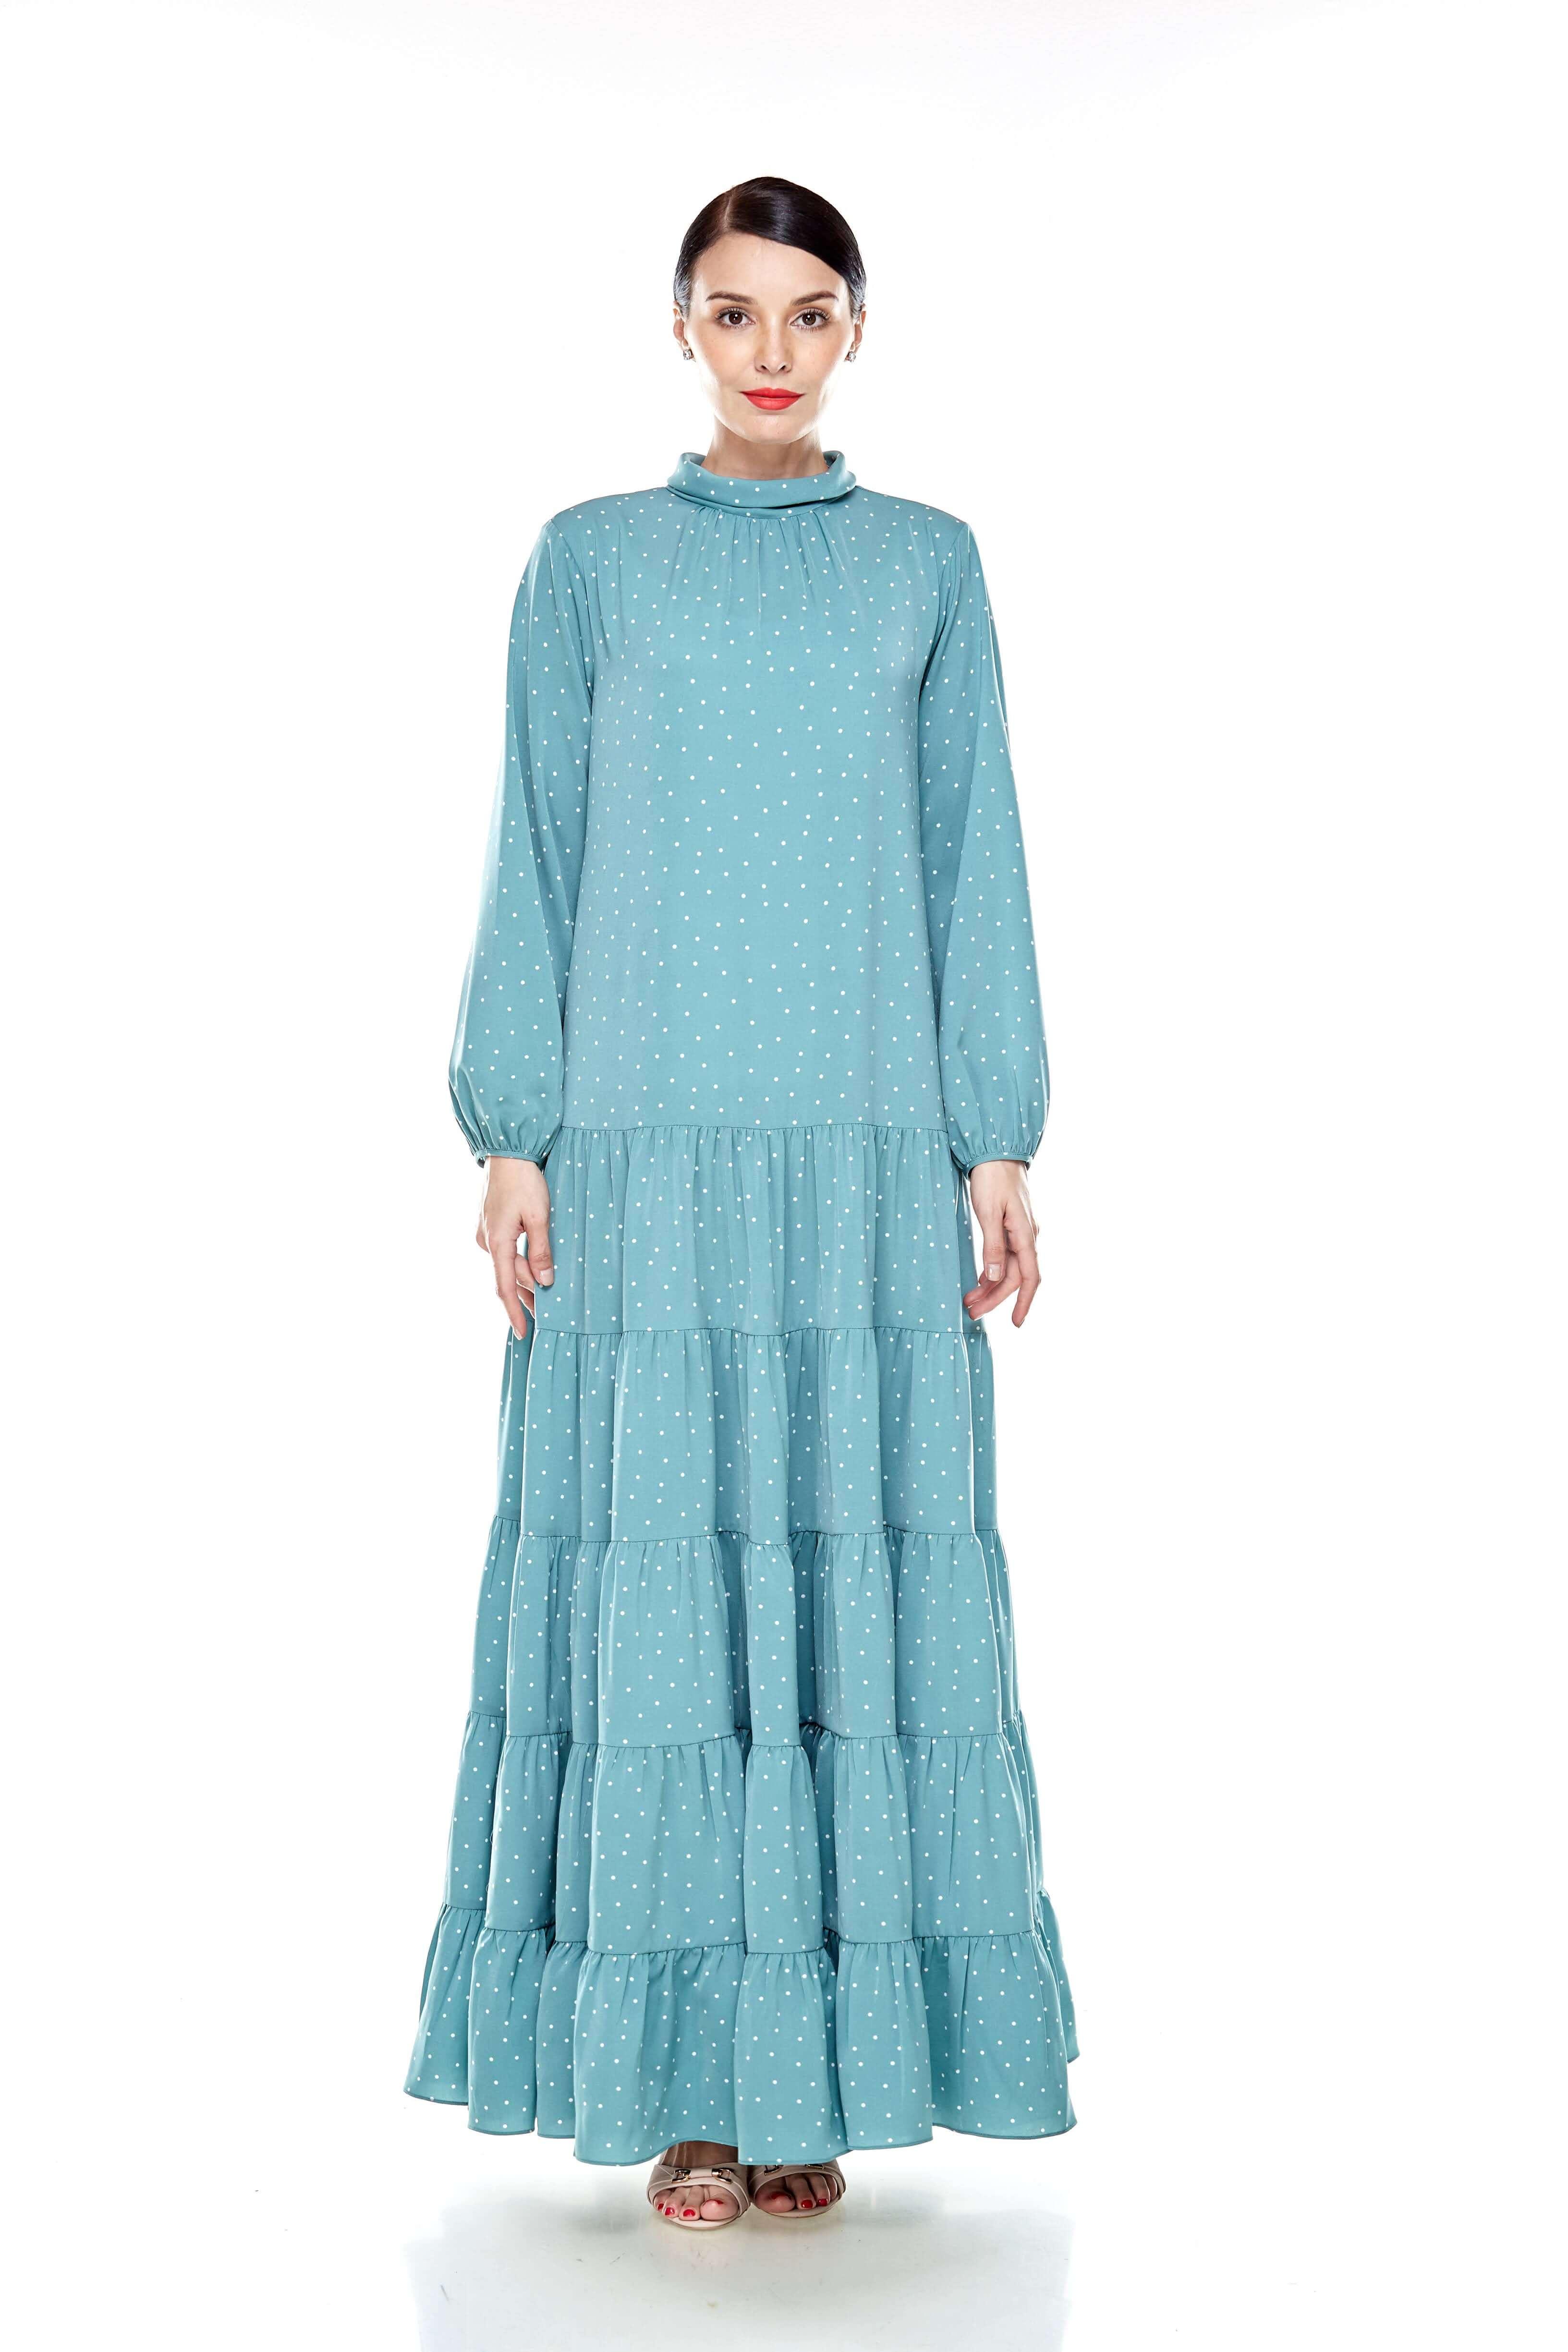 Mint Polka Dot Stand Collar Tier Dress (3)